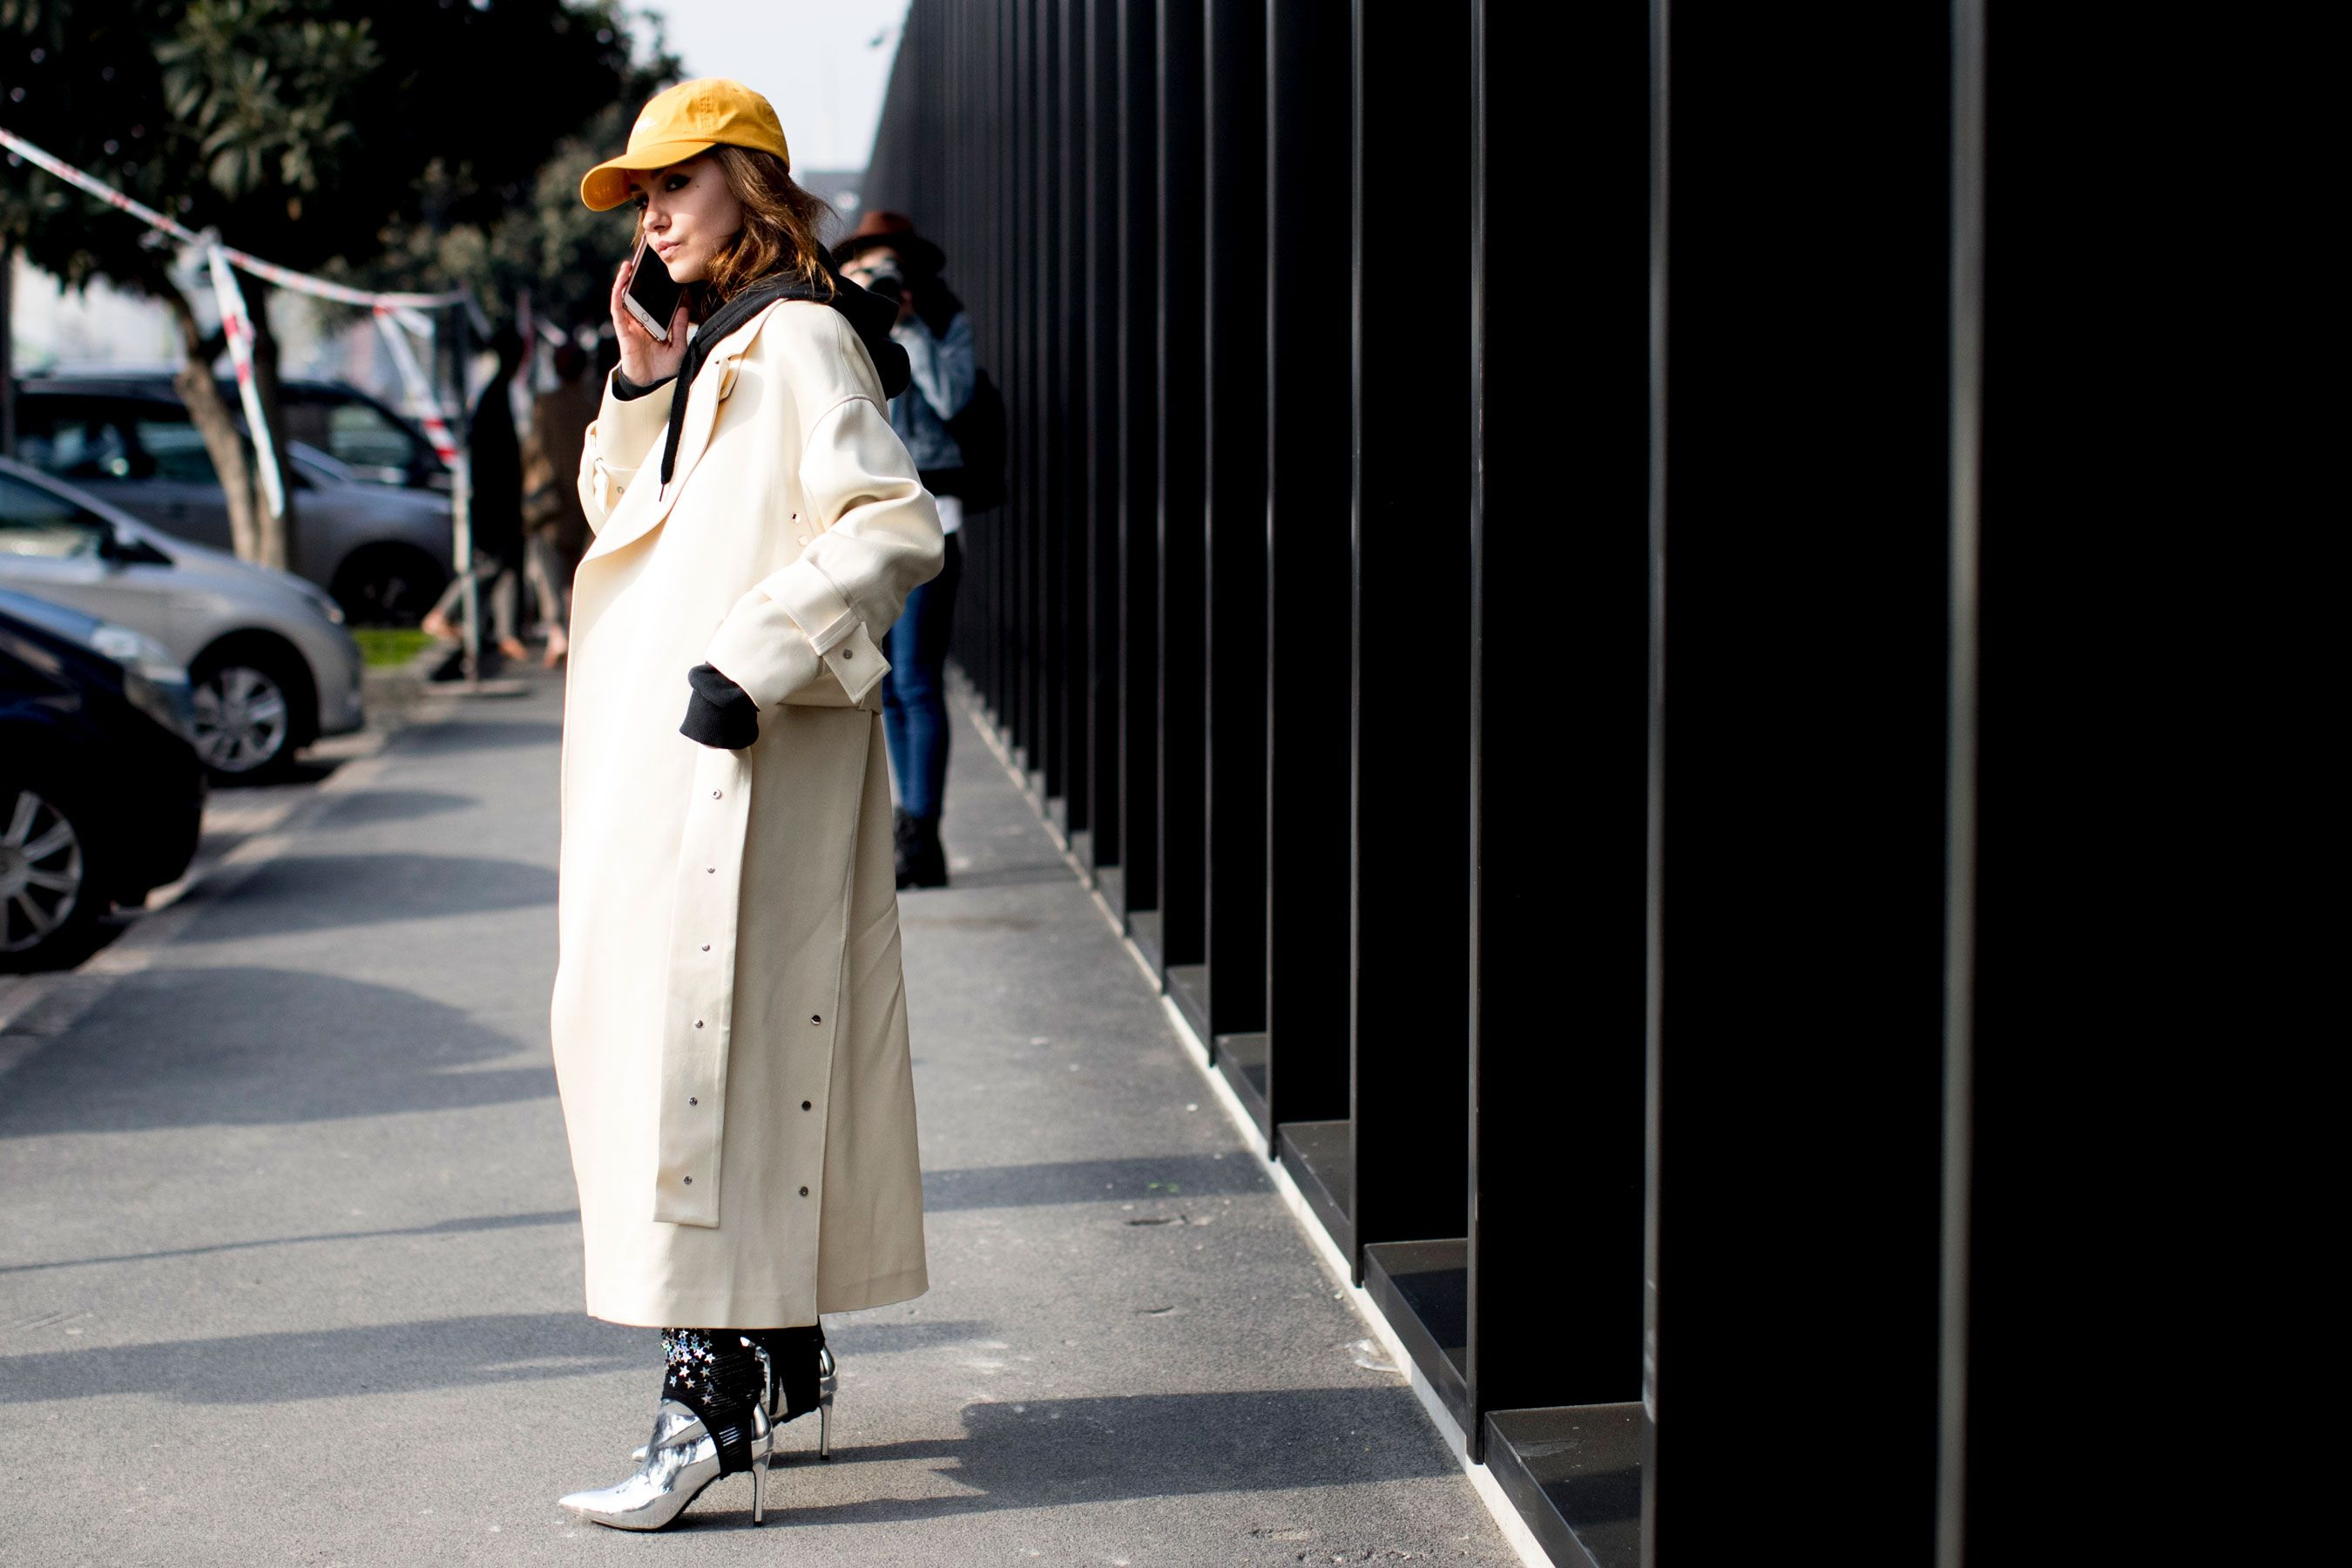 Milan Fashion Week Fall 2017 Street Style Day 1 - The Impression